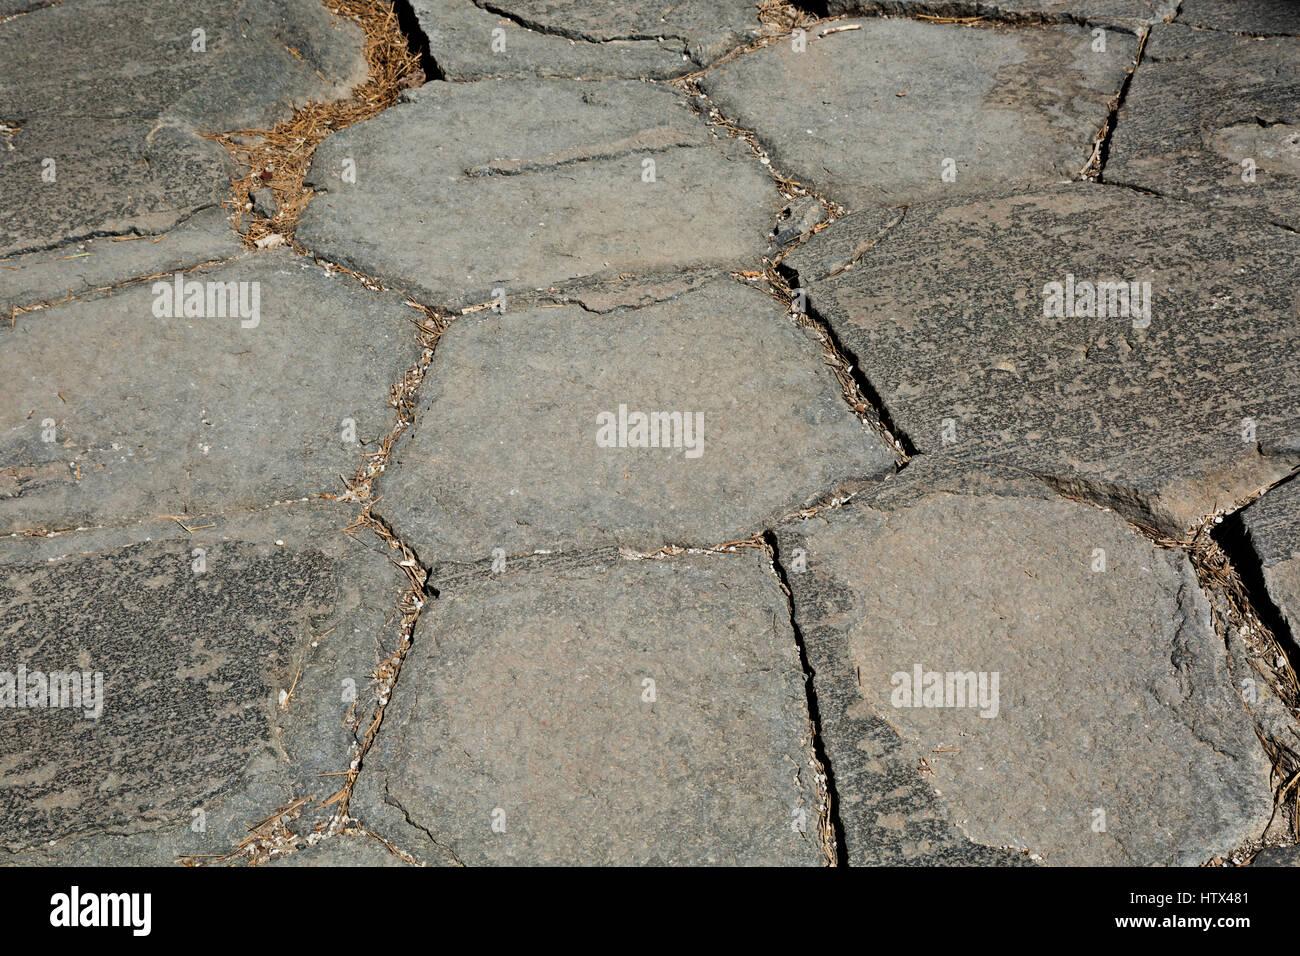 CA03044-00...CALIFORNIA - Glacier polished hexagonal heads of columnar basalt in Devils Postpile National Monument. - Stock Image